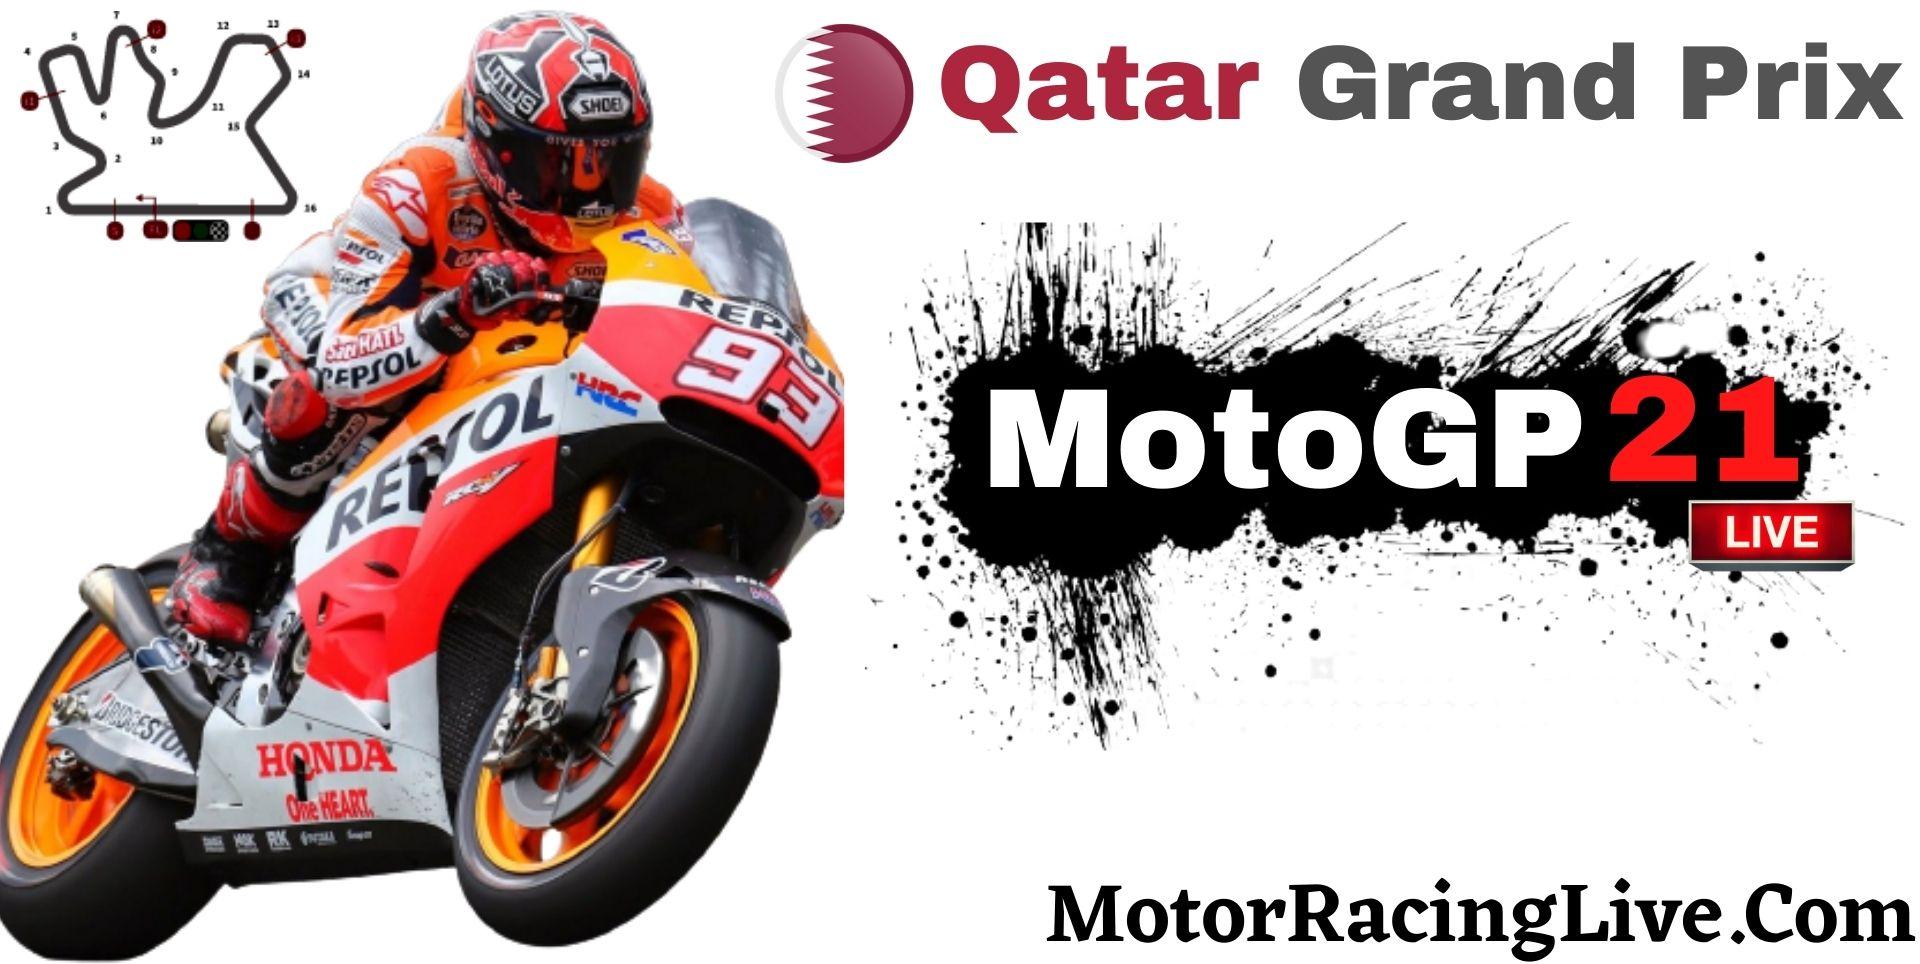 Qatar Grand Prix Live Streaming